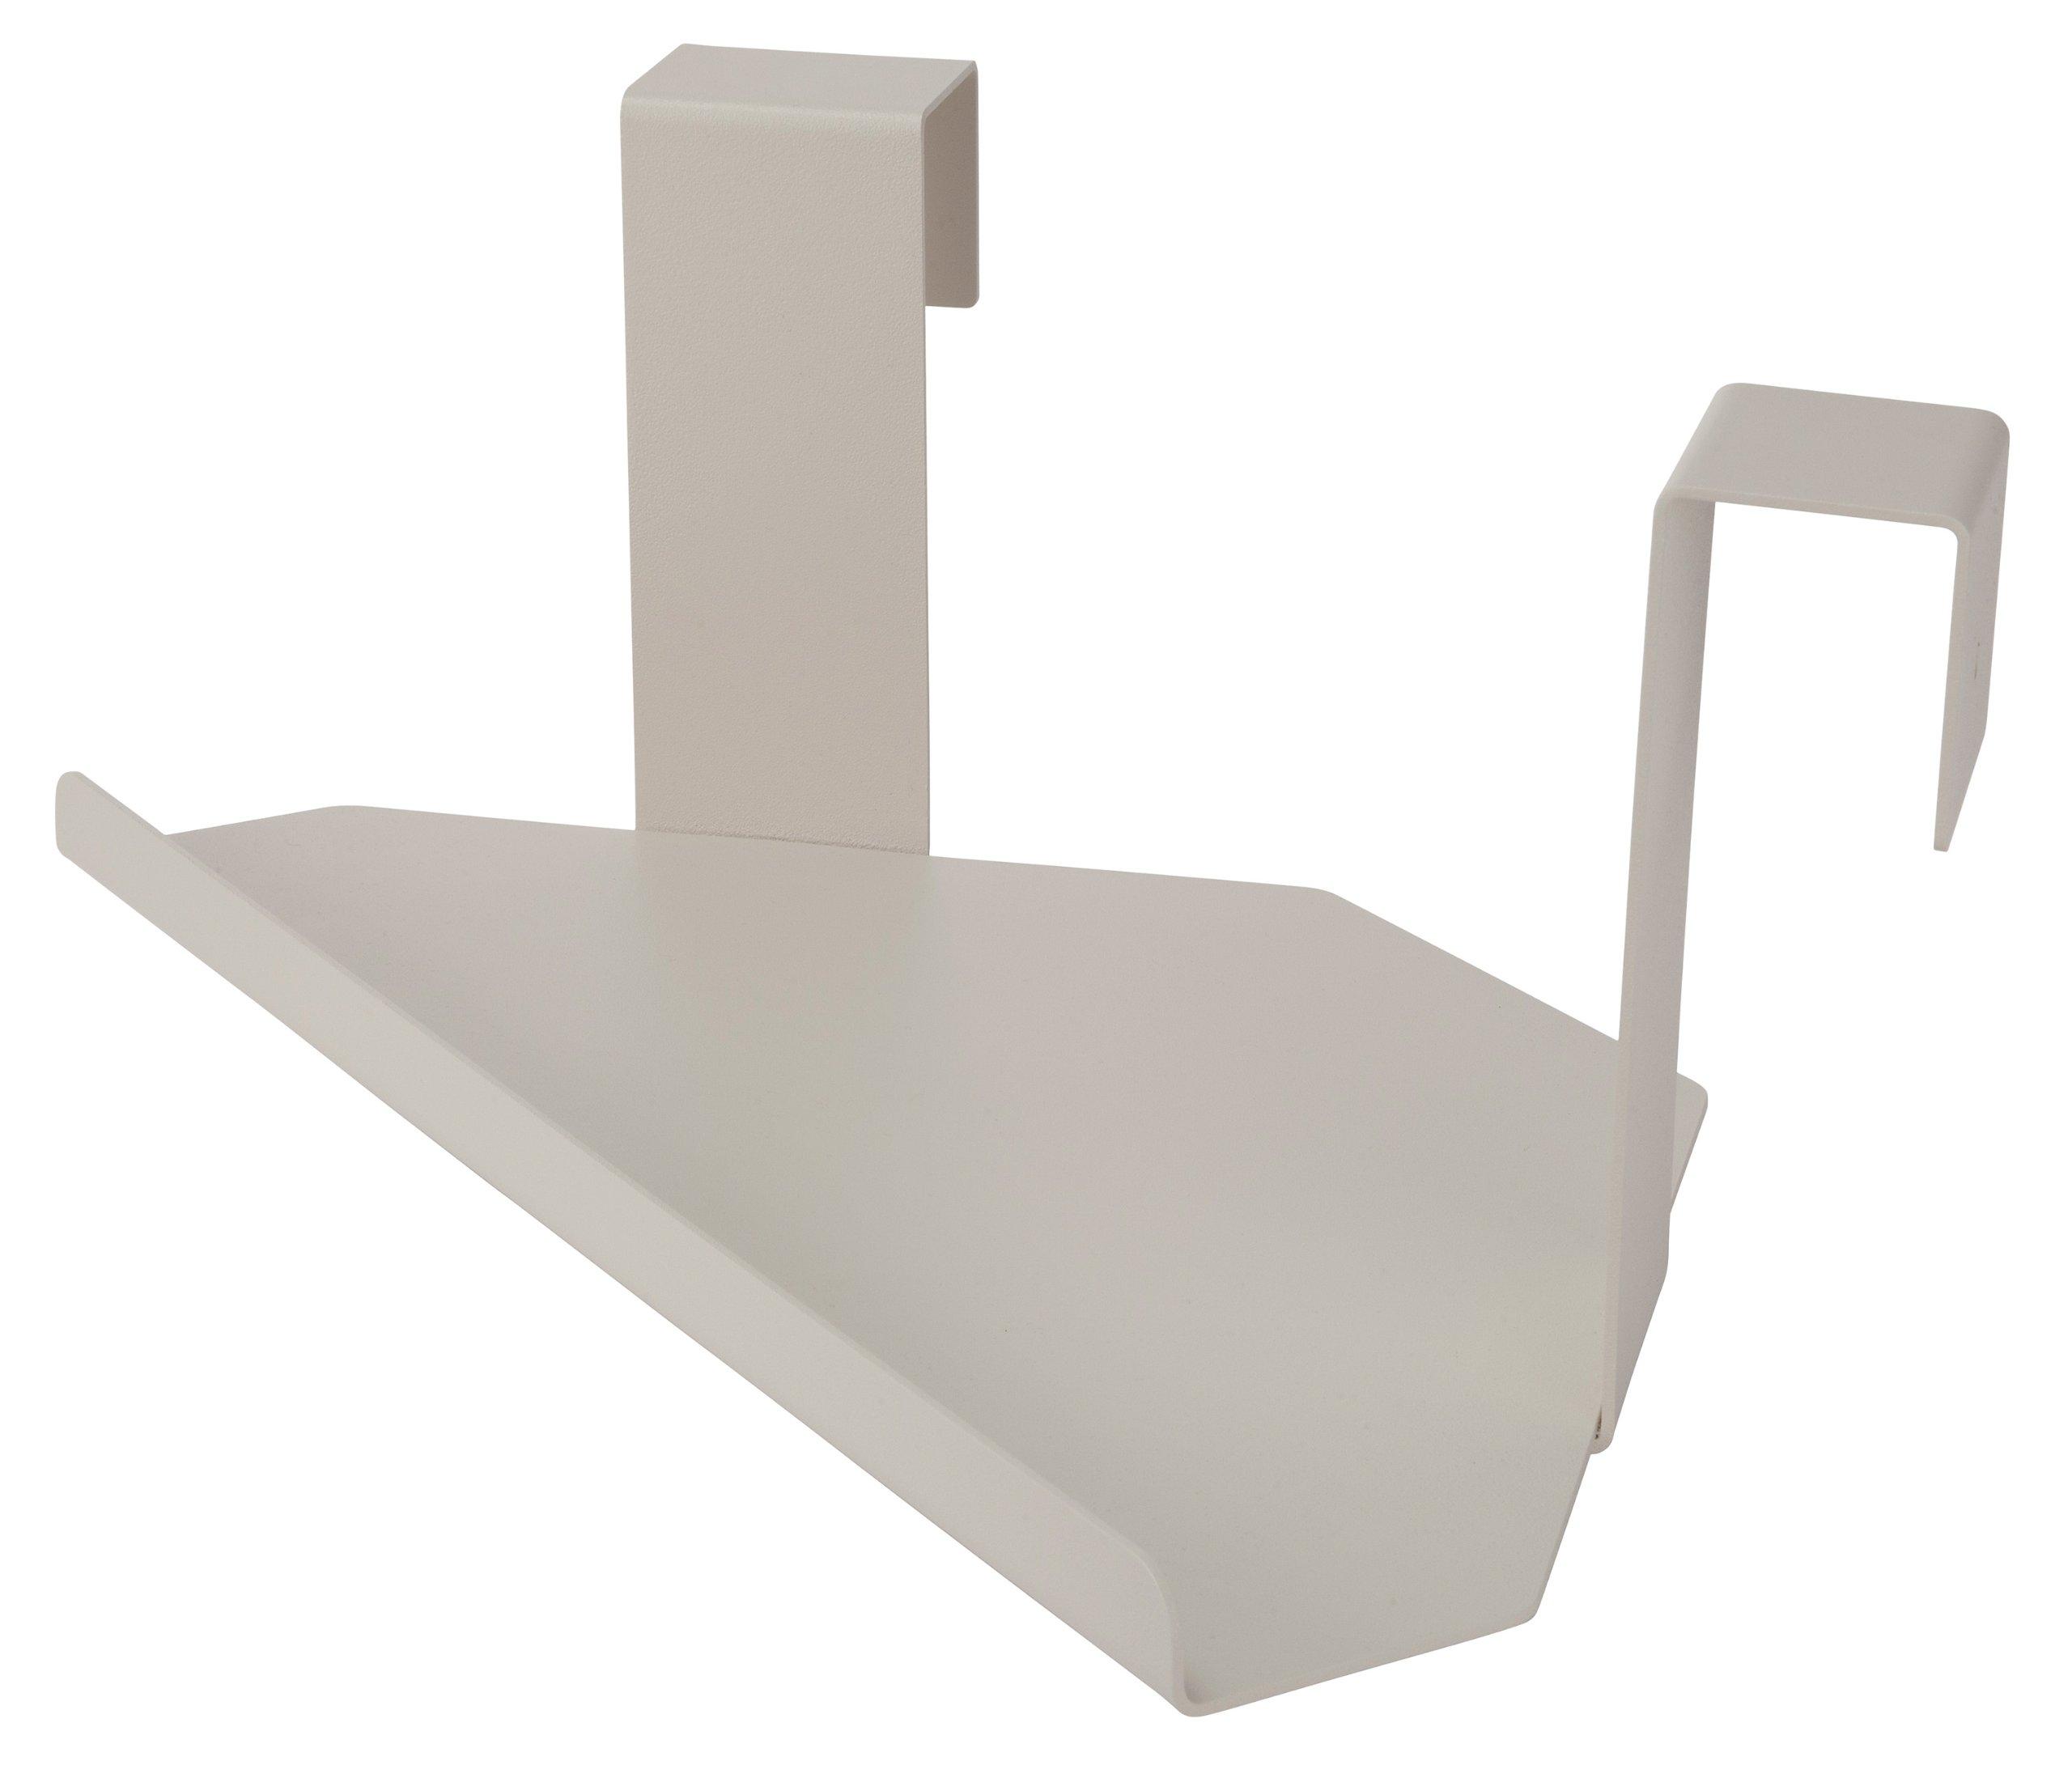 MIDE Products 23CST-1 Aluminum Corner Shelf, Tan